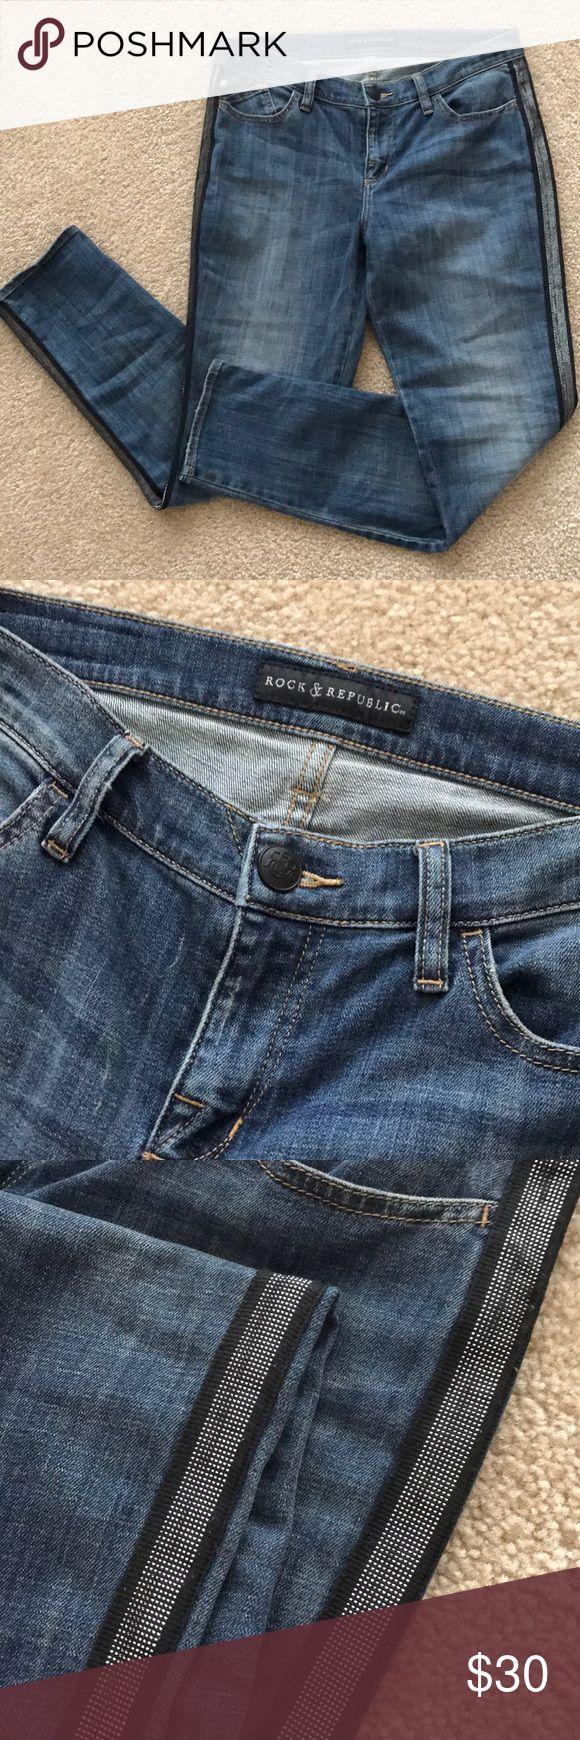 NWOT- Rock & Republic Jeans Women's Size 12 Never worn! Size 12 Rock & Republic Jeans with an awesome metallic tuxedo strip detail!  Smoke & pet free Rock & Republic Jeans Skinny